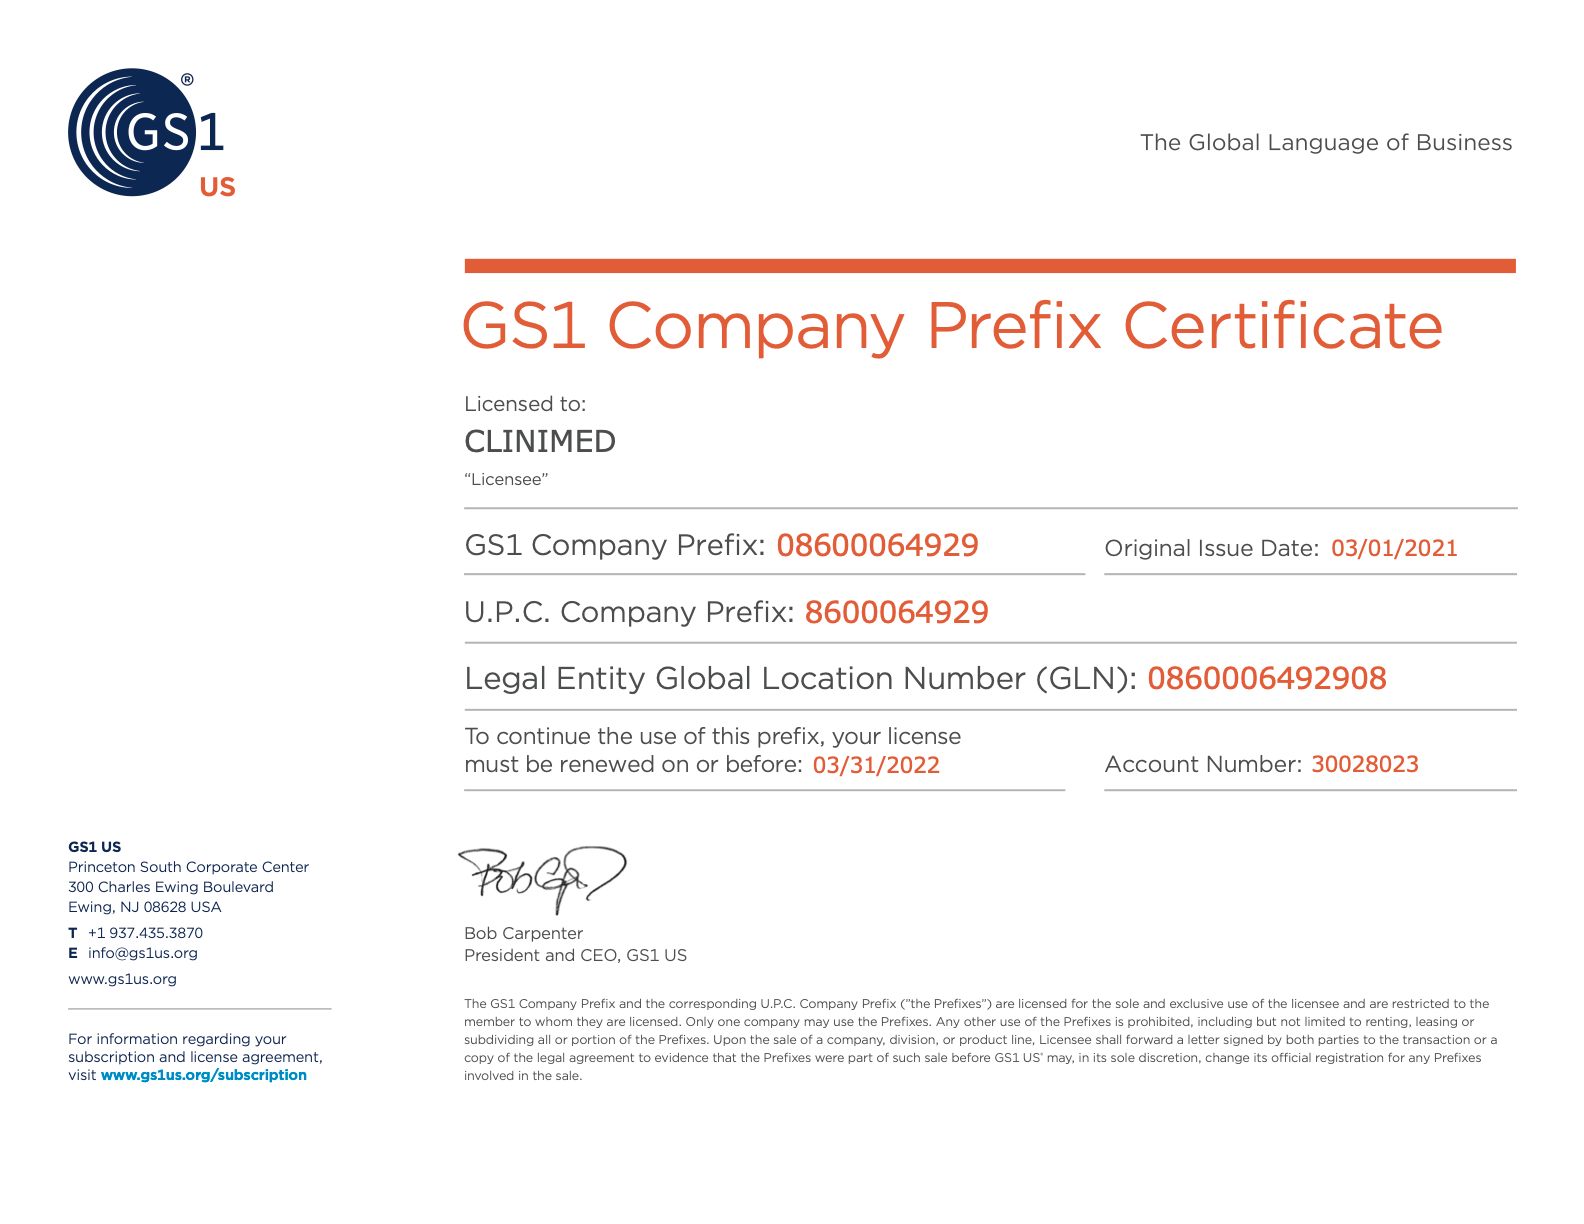 PrefixCertificate08600064929